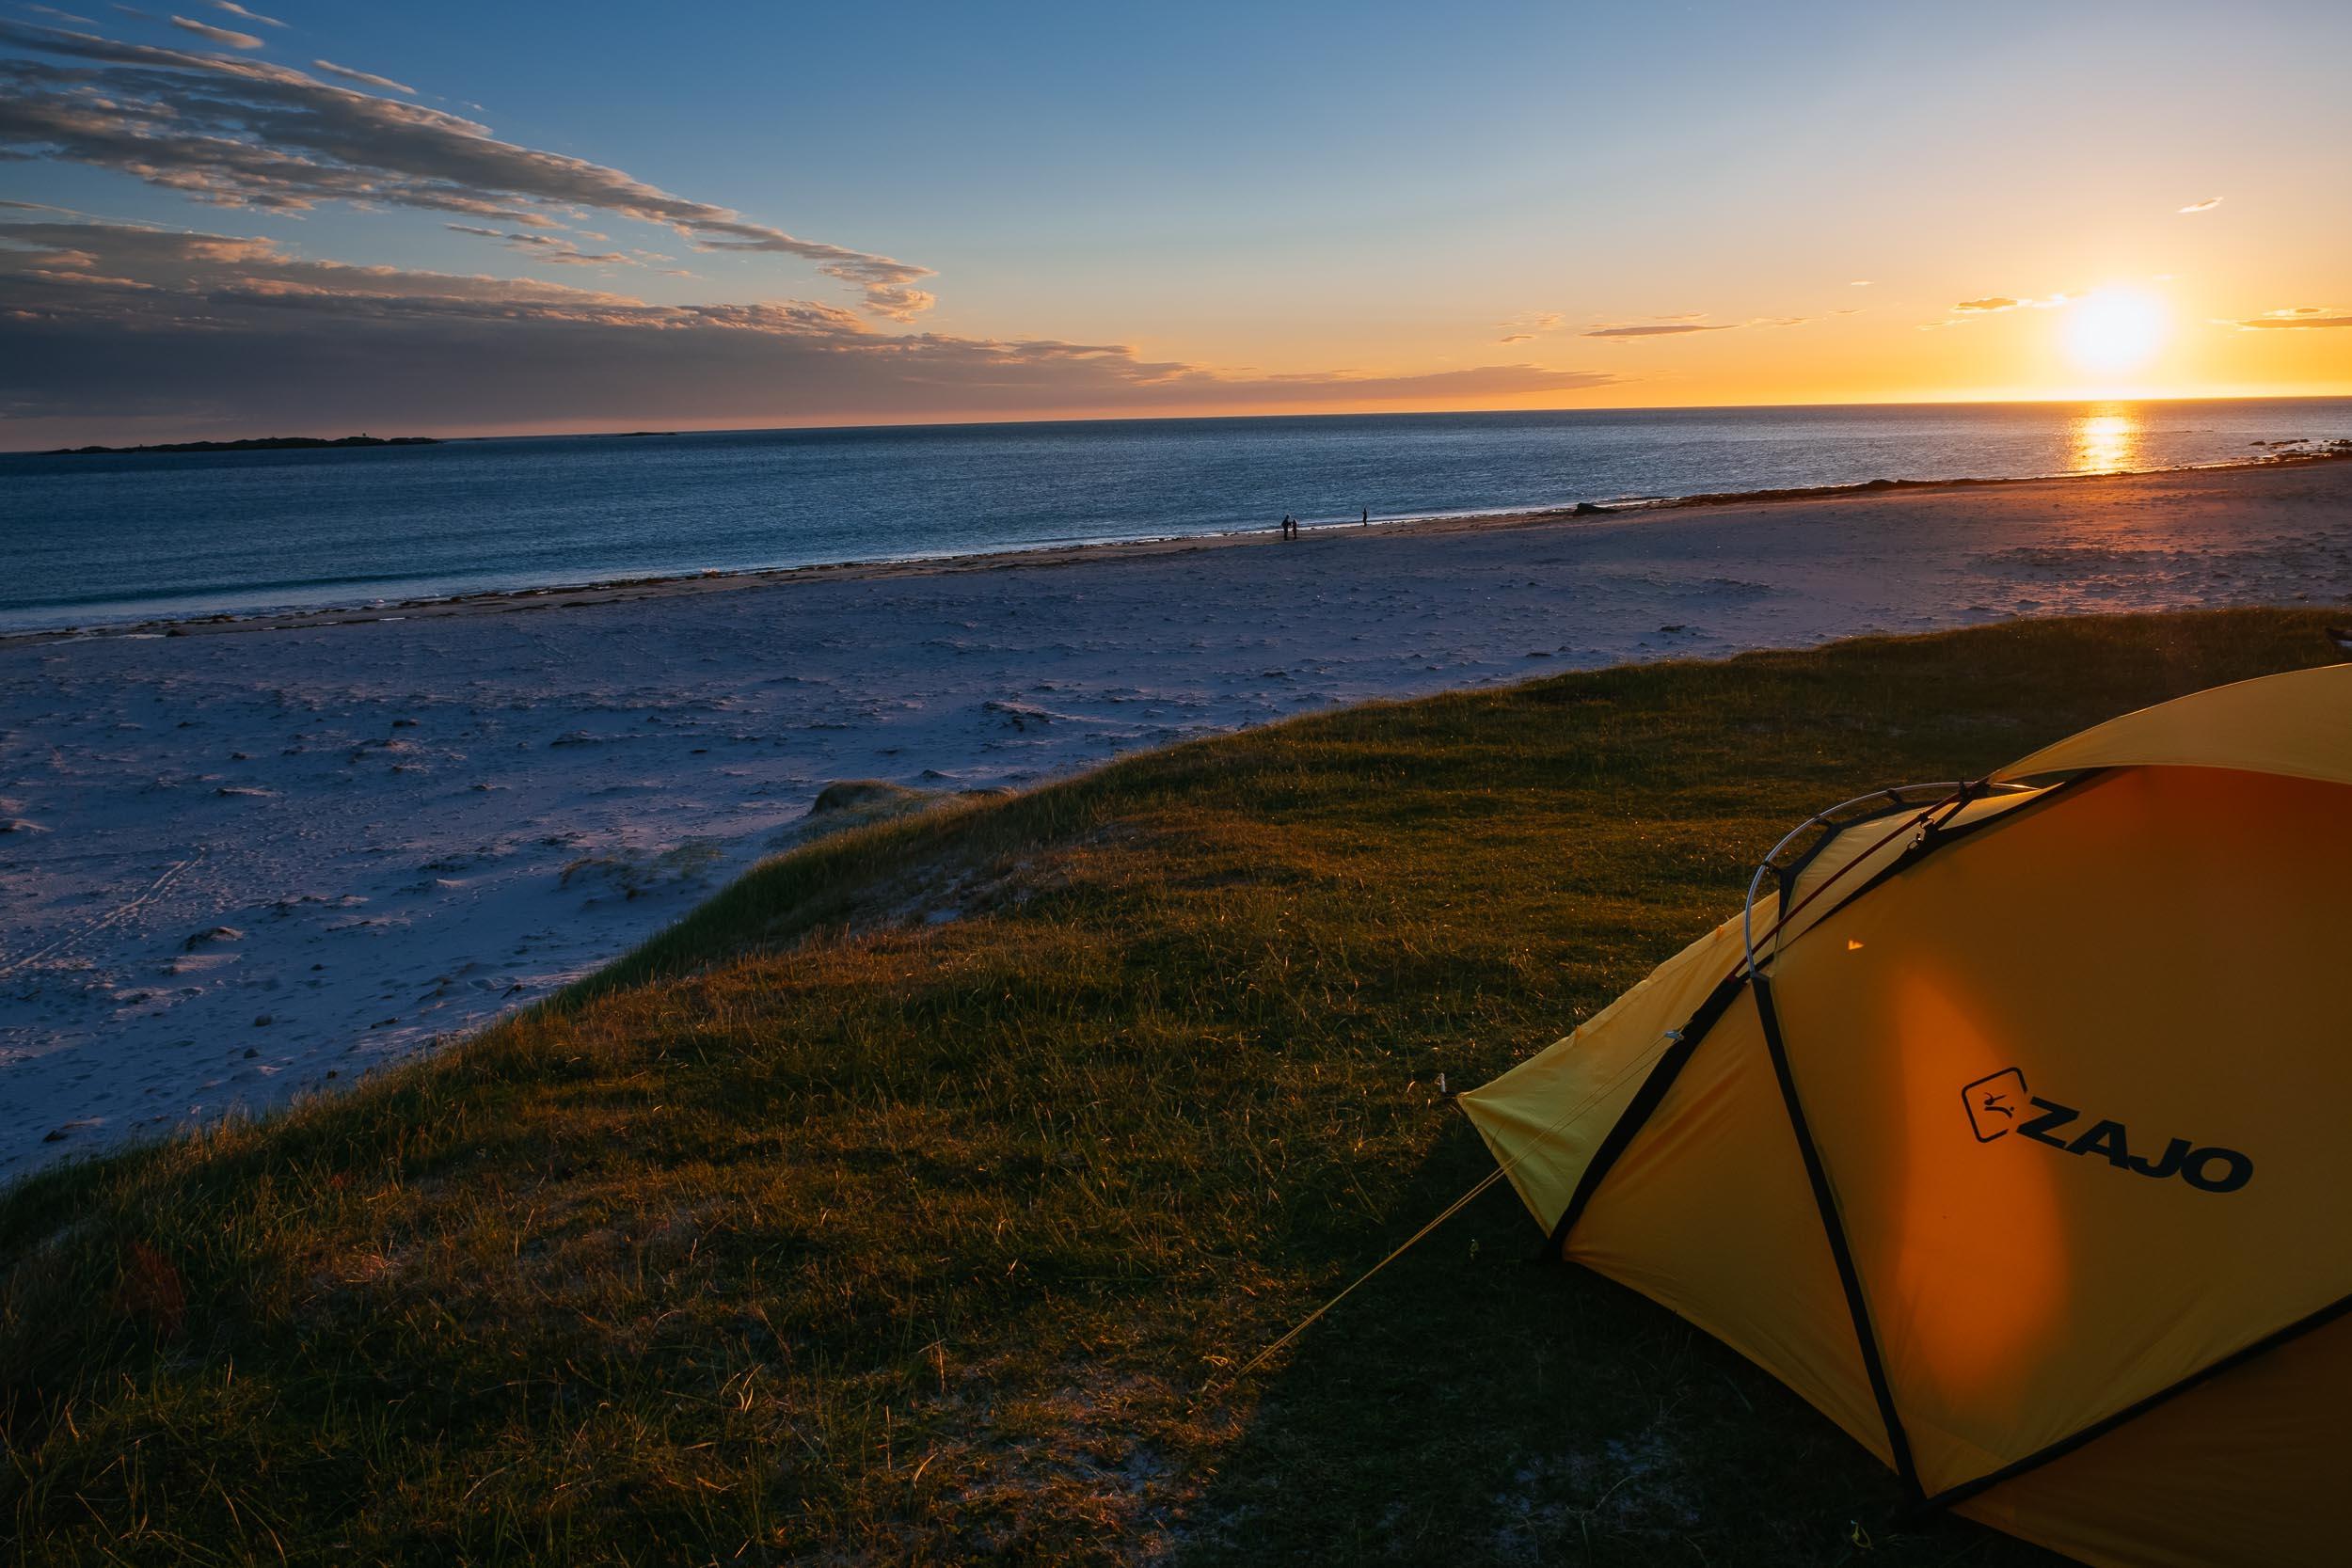 Camping under the midnight sun in Lofoten, Norway.